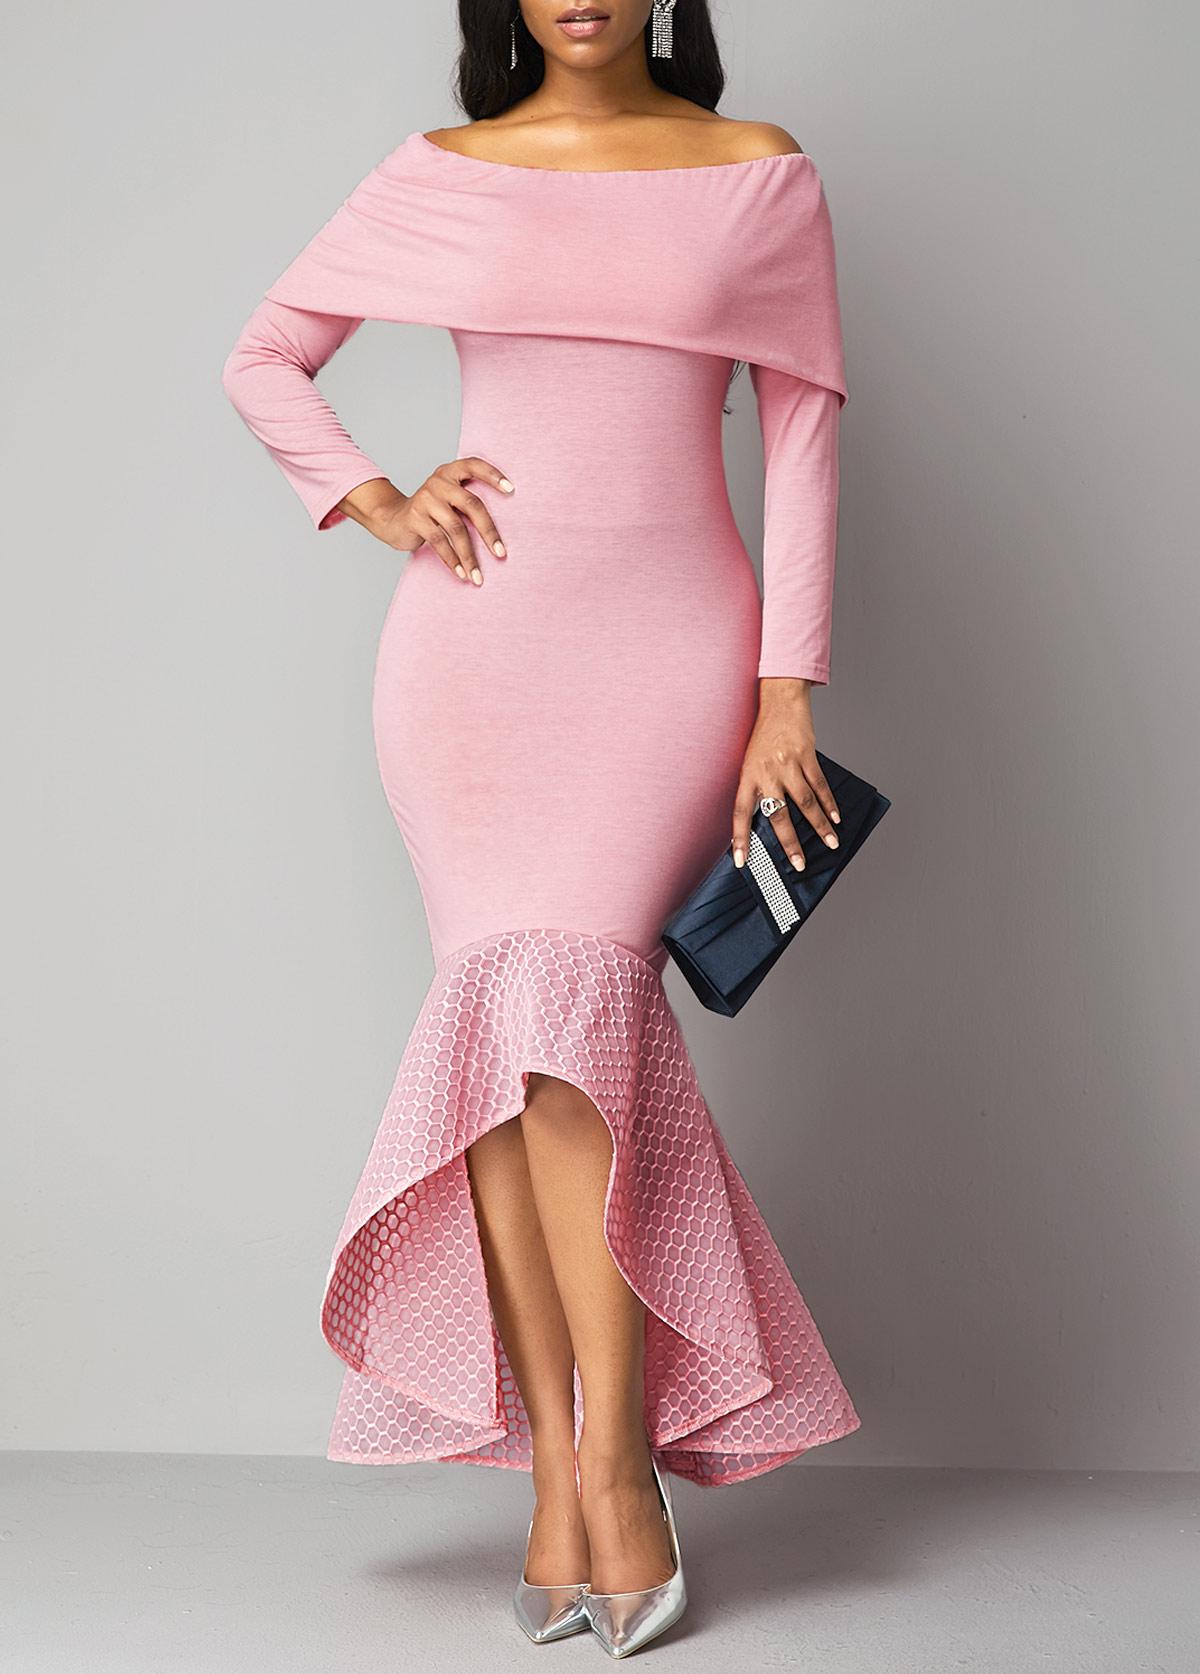 Lace Panel Zipper Back Overlay Dress